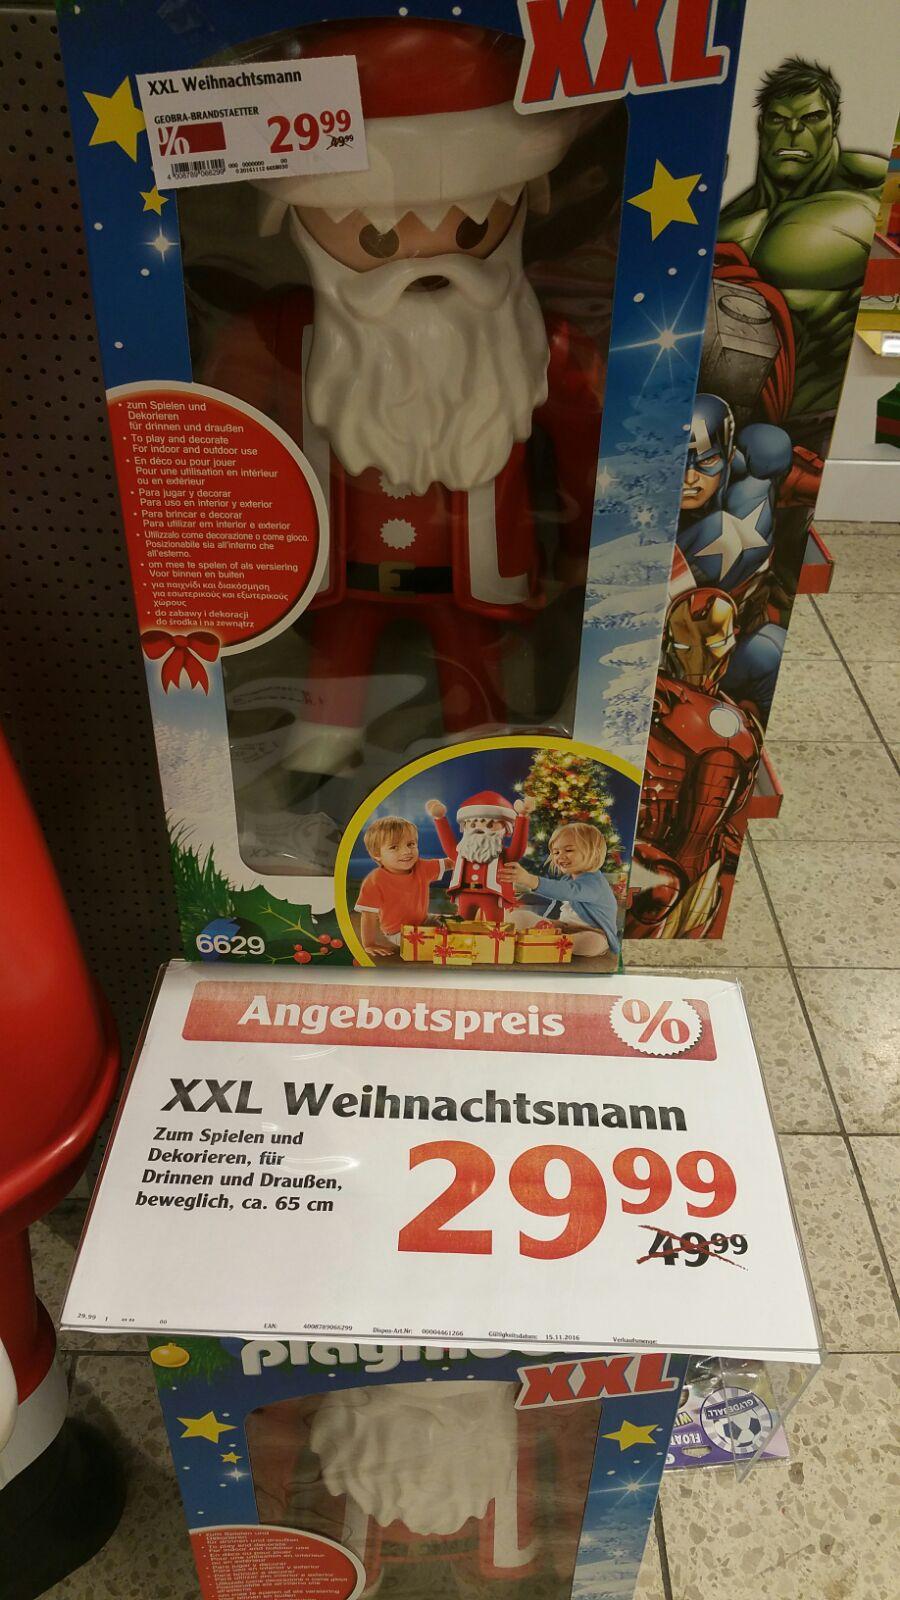 [ Local ] Globus Völklingen - Playmobil XXL Weihnachtsmann (6629)